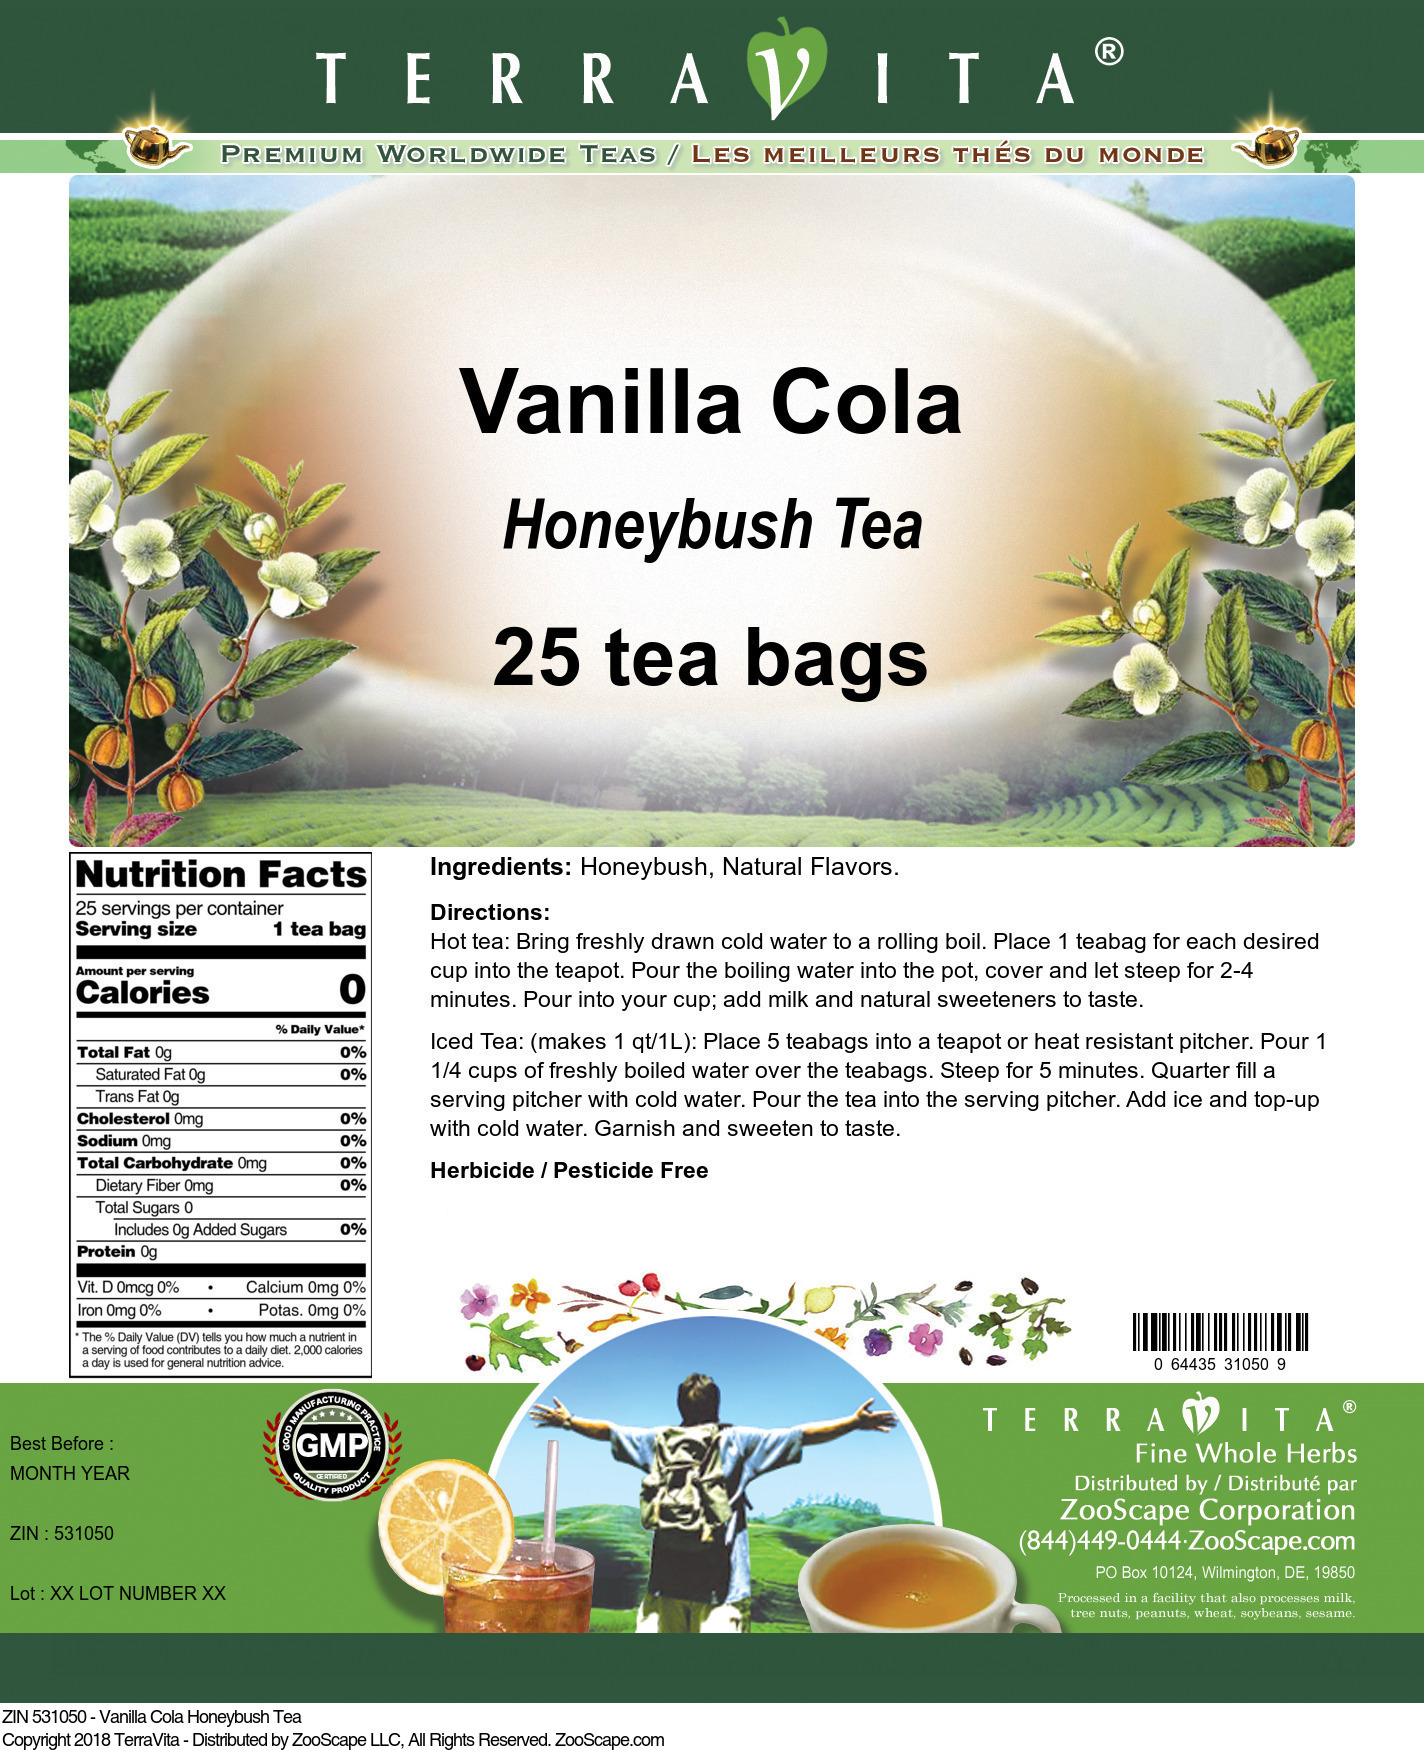 Vanilla Cola Honeybush Tea